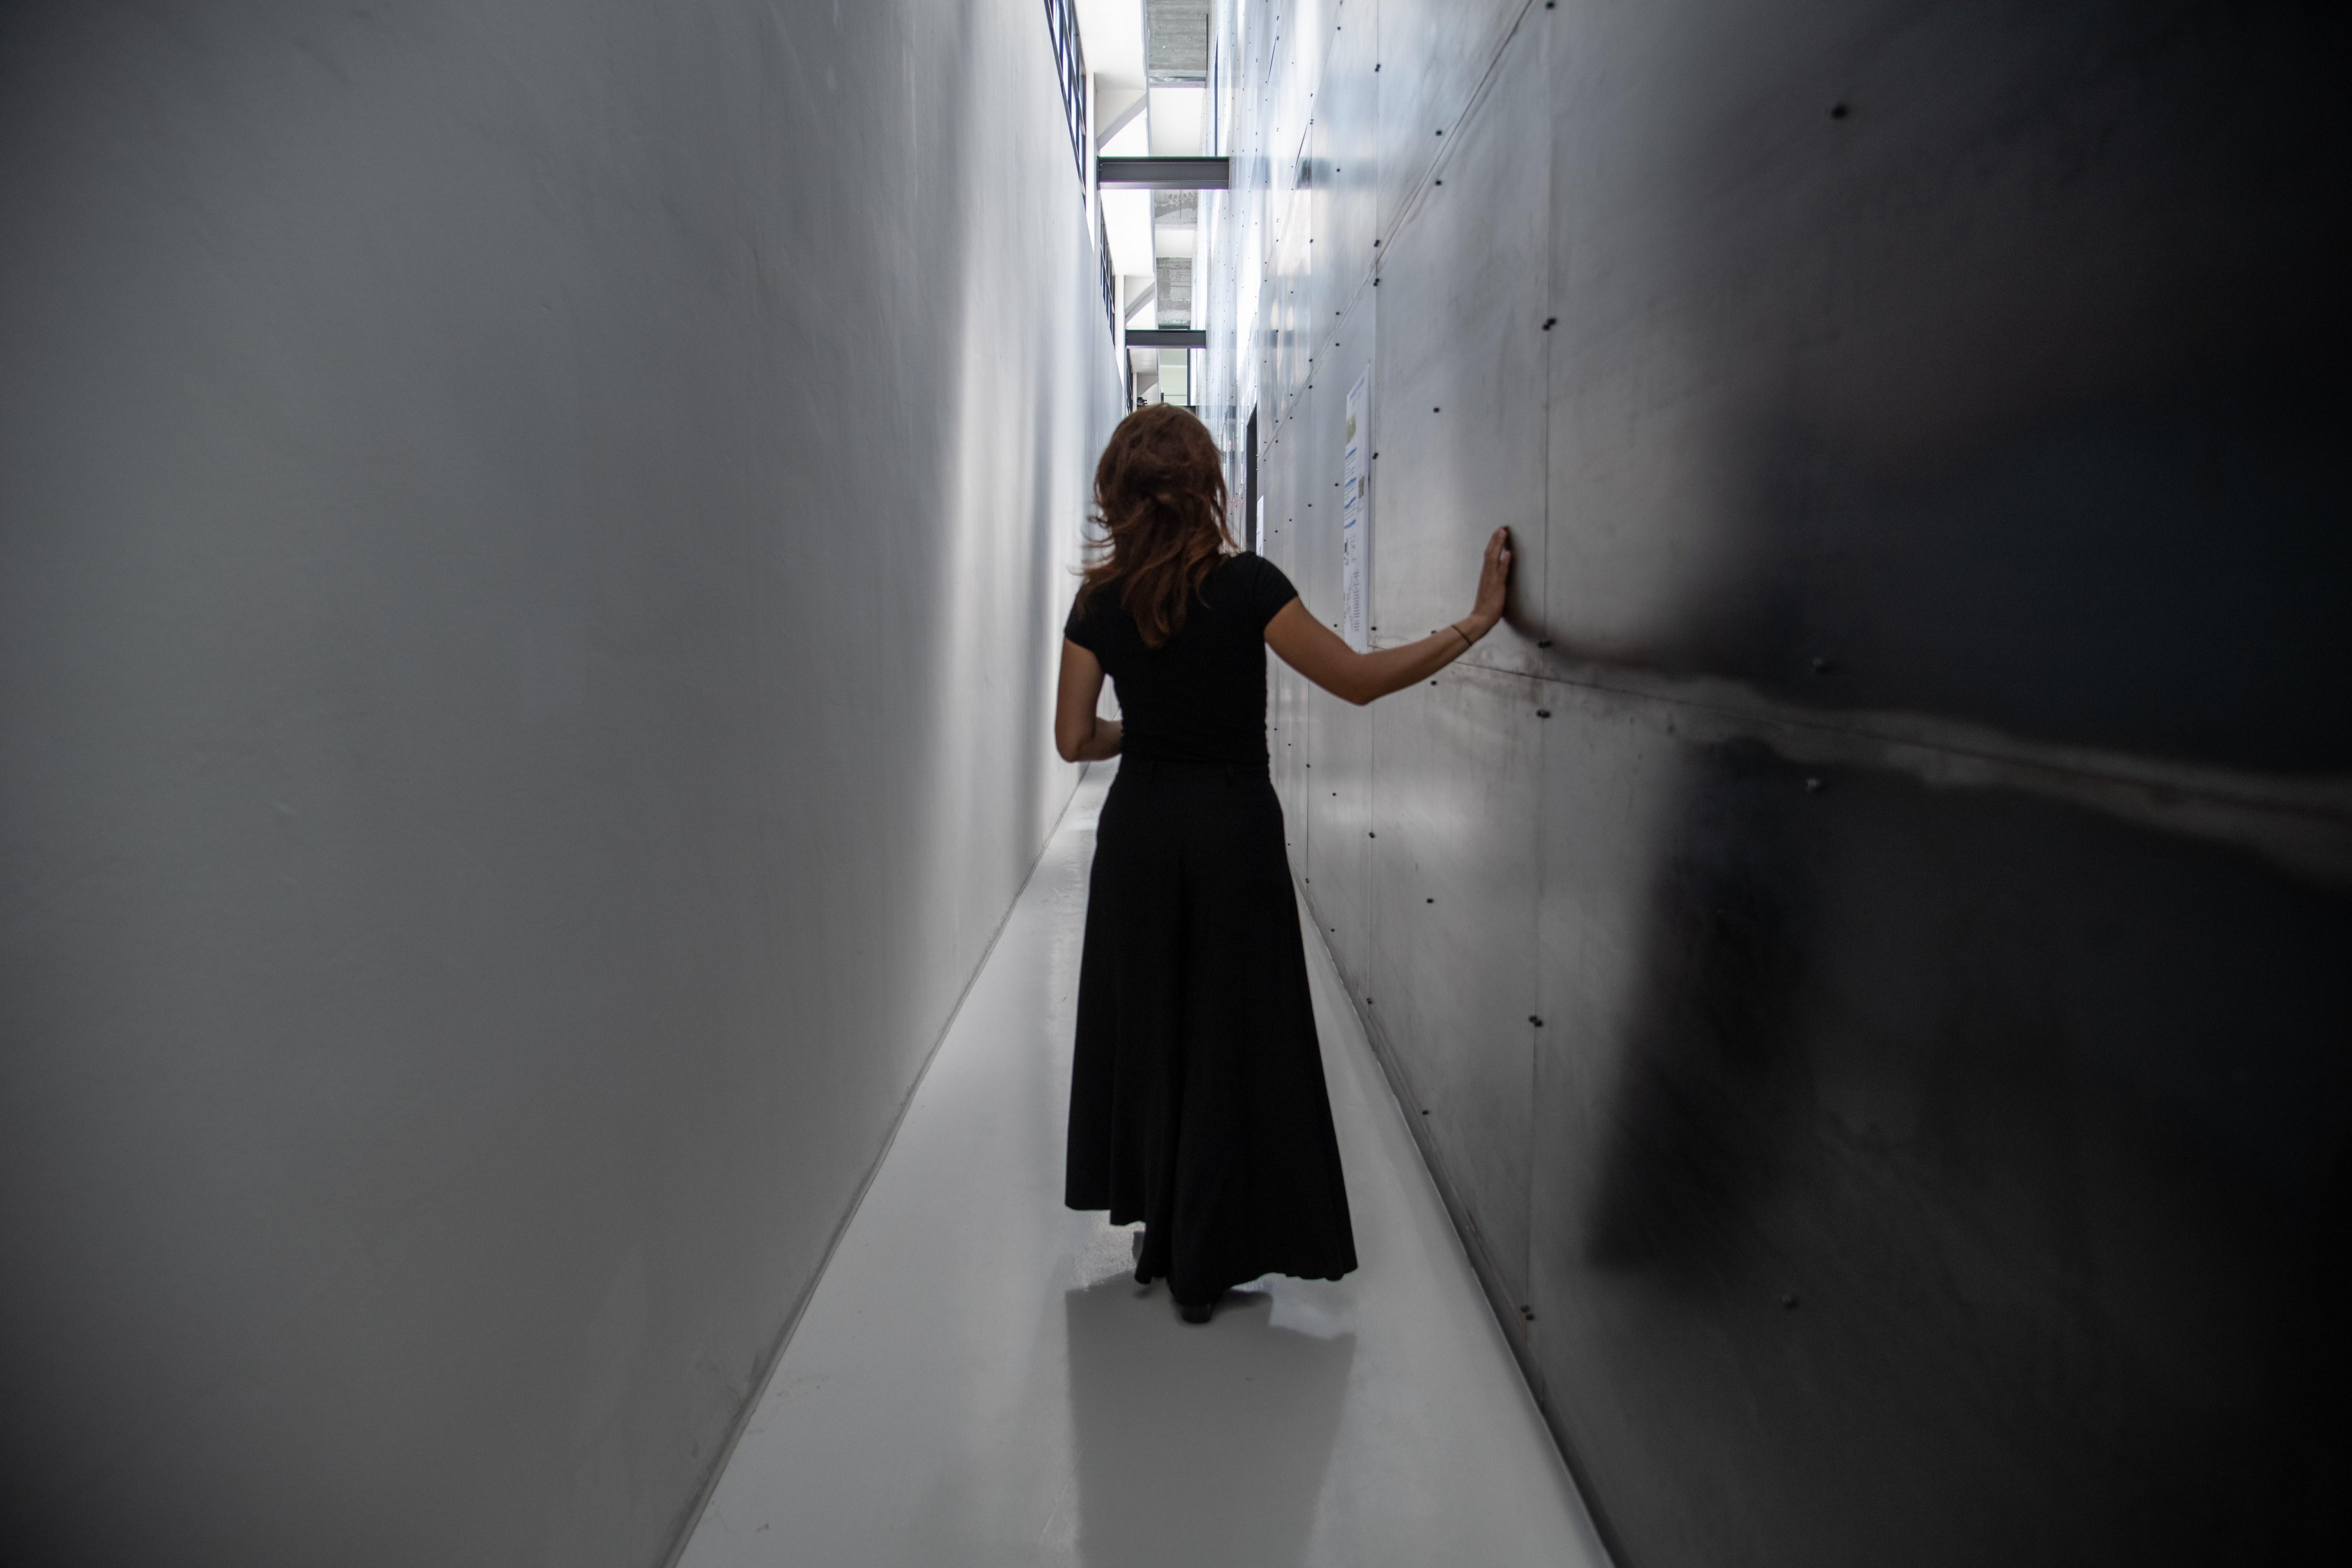 http://www.danzaurbana.eu/festival/wp-content/uploads/20180717_Square_LorenzoBianchiHoesh_BolzanoDanza_NOI_phAndreaMacchia_2556_REV.jpg